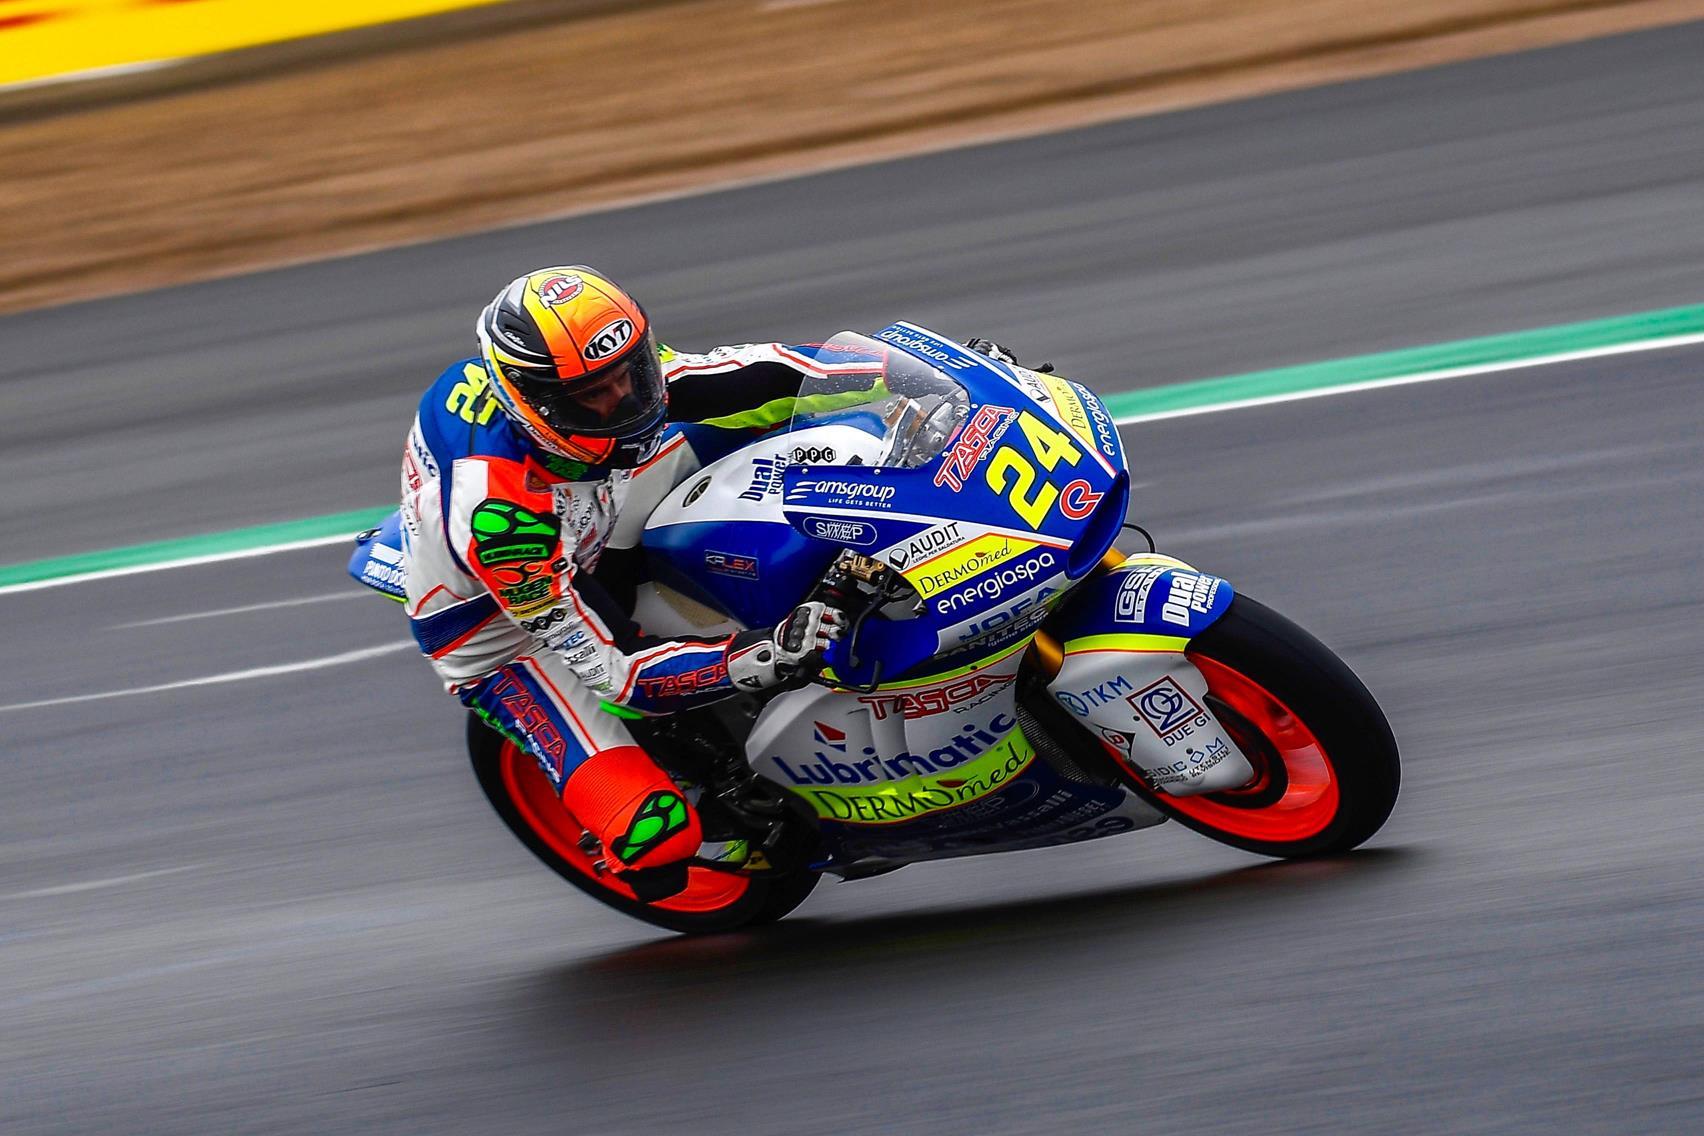 MOTO 2 MotoGp Thailandia 2018 – Simone Corsi